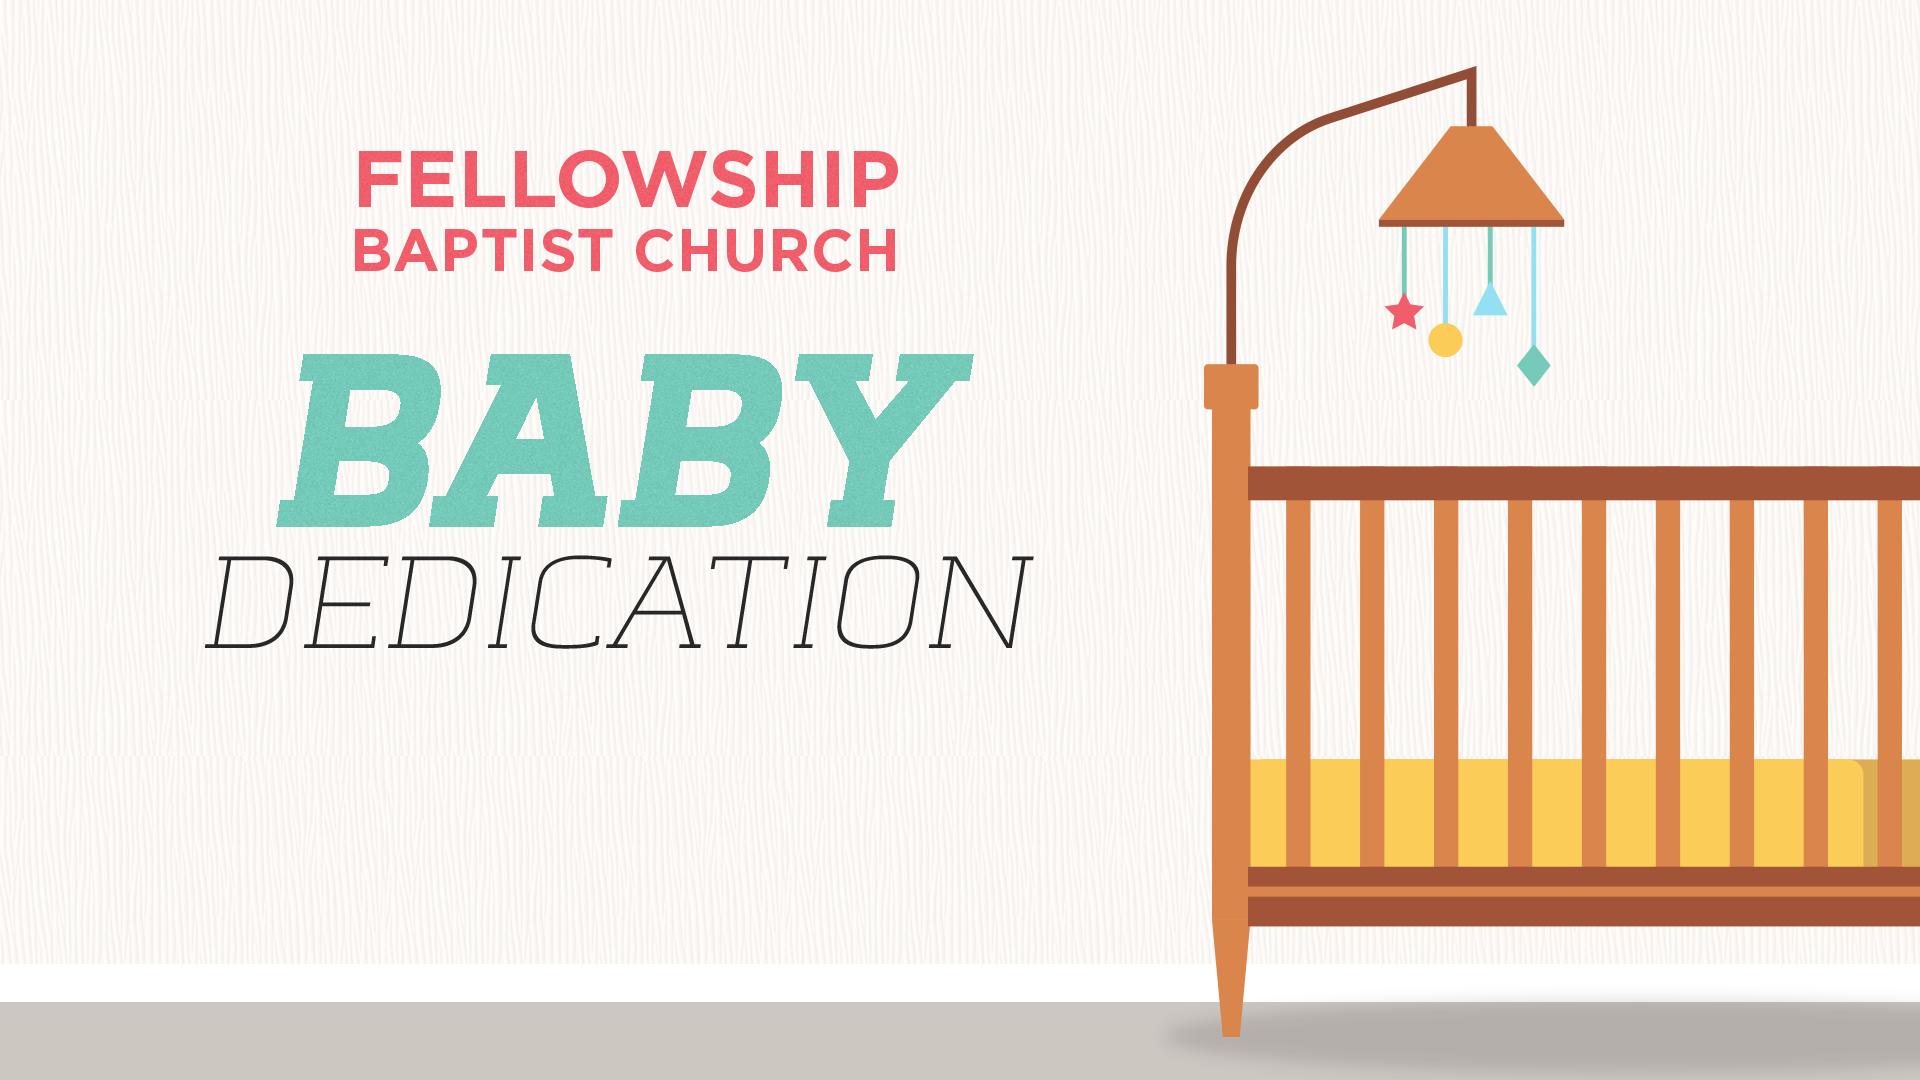 Fbc baby dedication